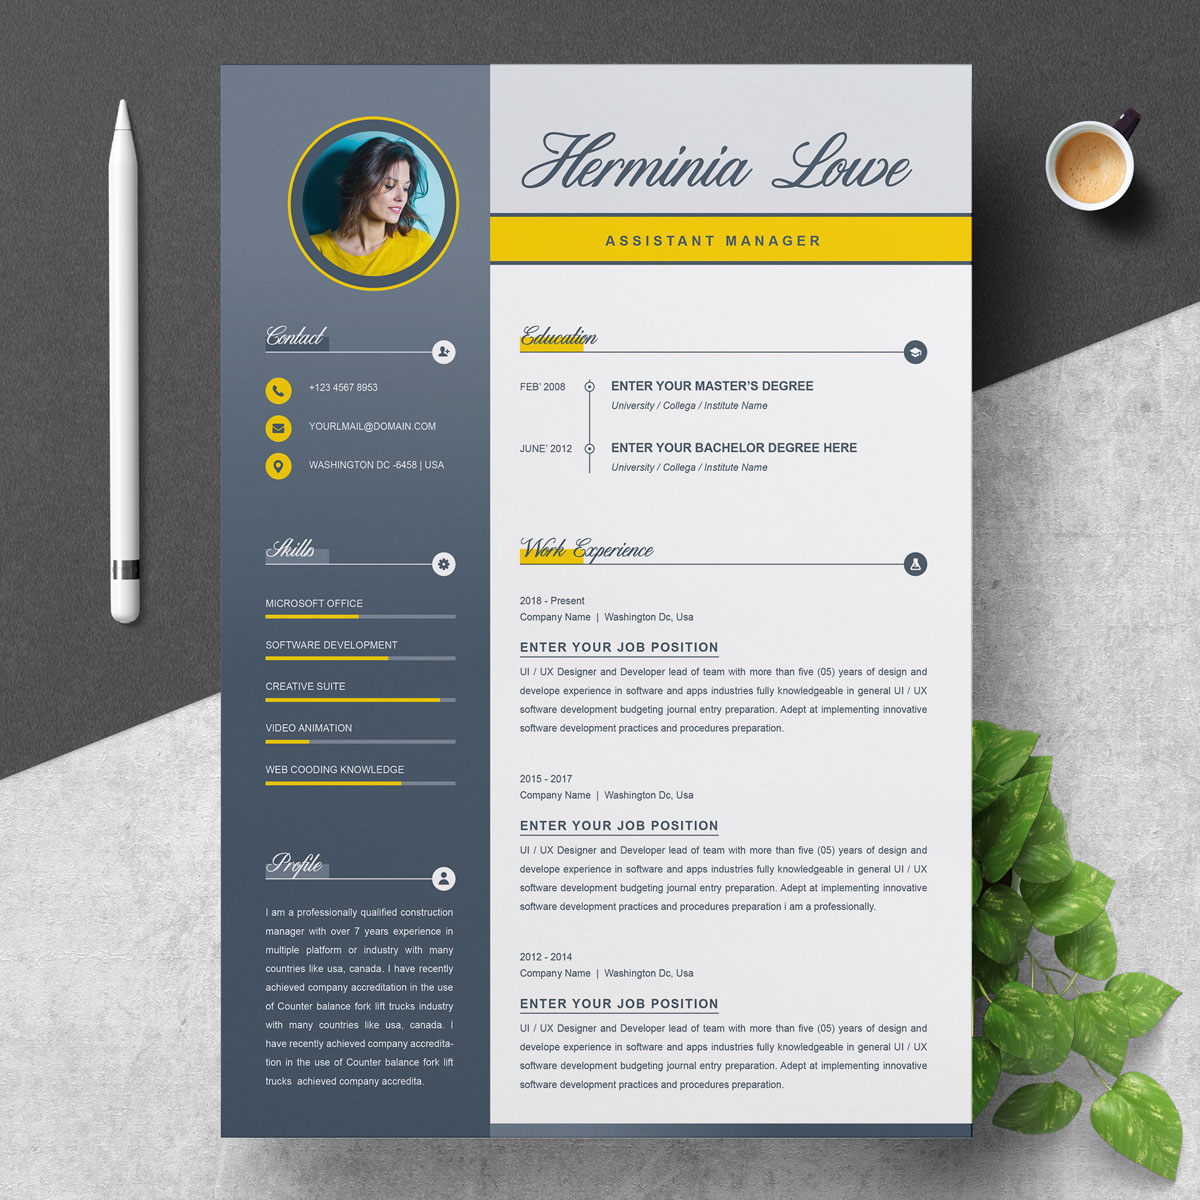 Herminia Lowe - Resume Template